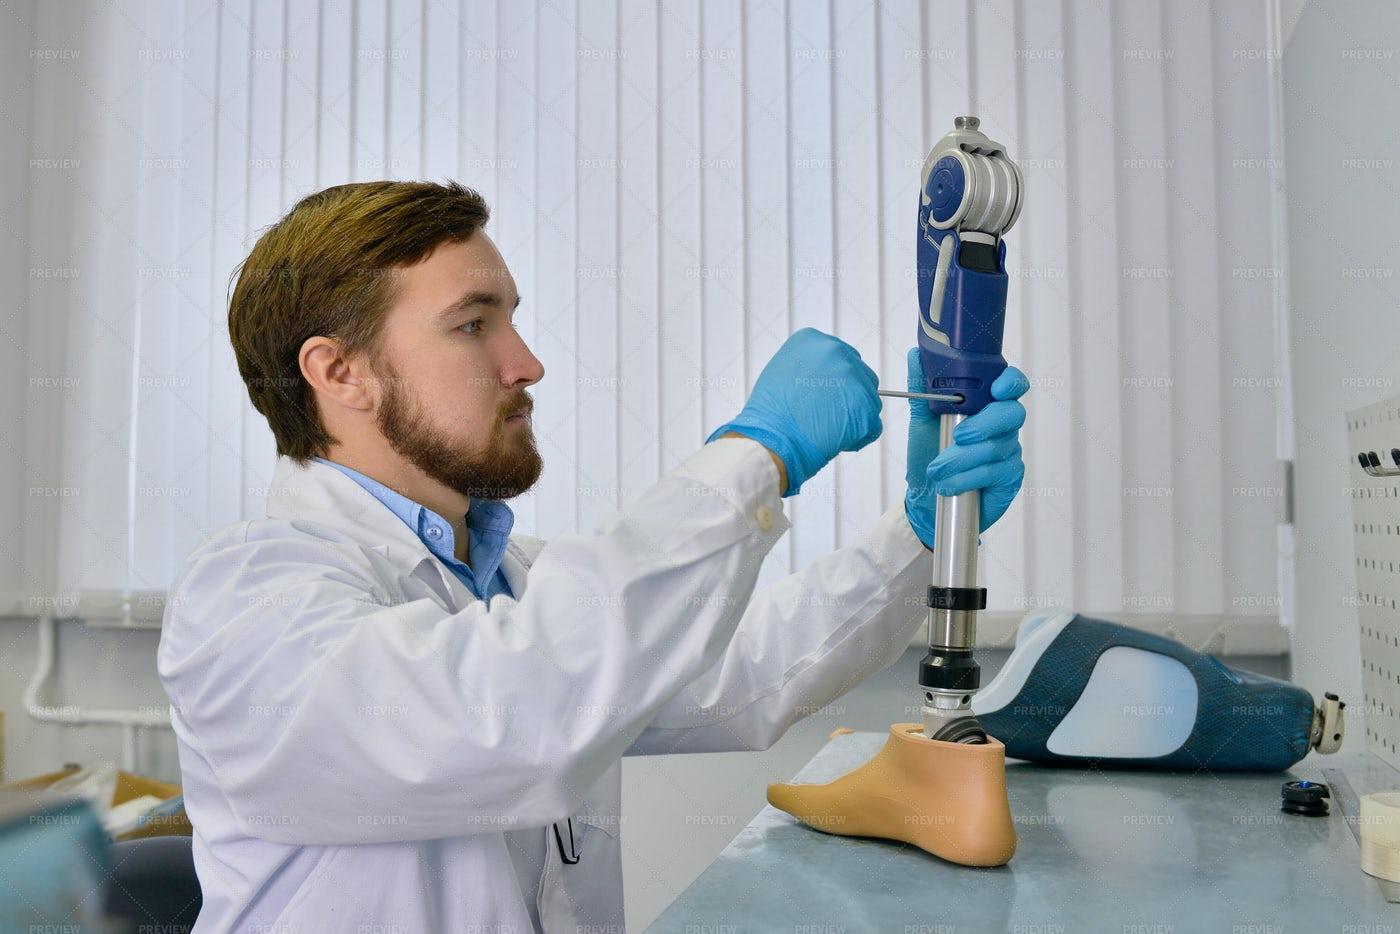 Prosthetist Repairing Artificial...: Stock Photos